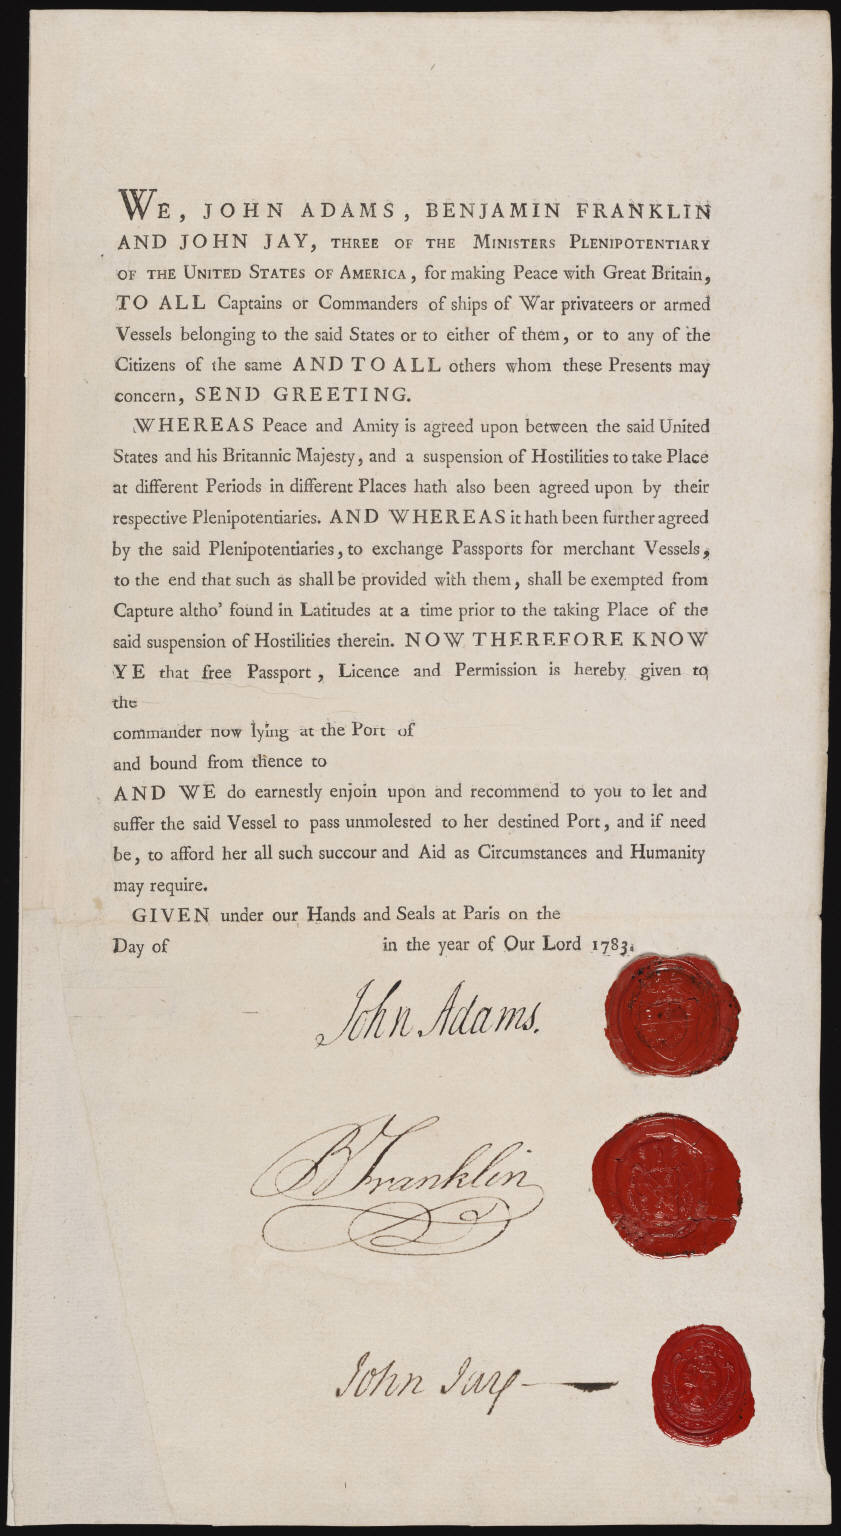 president john adams us passport for ministers plenipotentiary john adams benjamin franklin and john jay for safe passage to negotiate treaties 1783